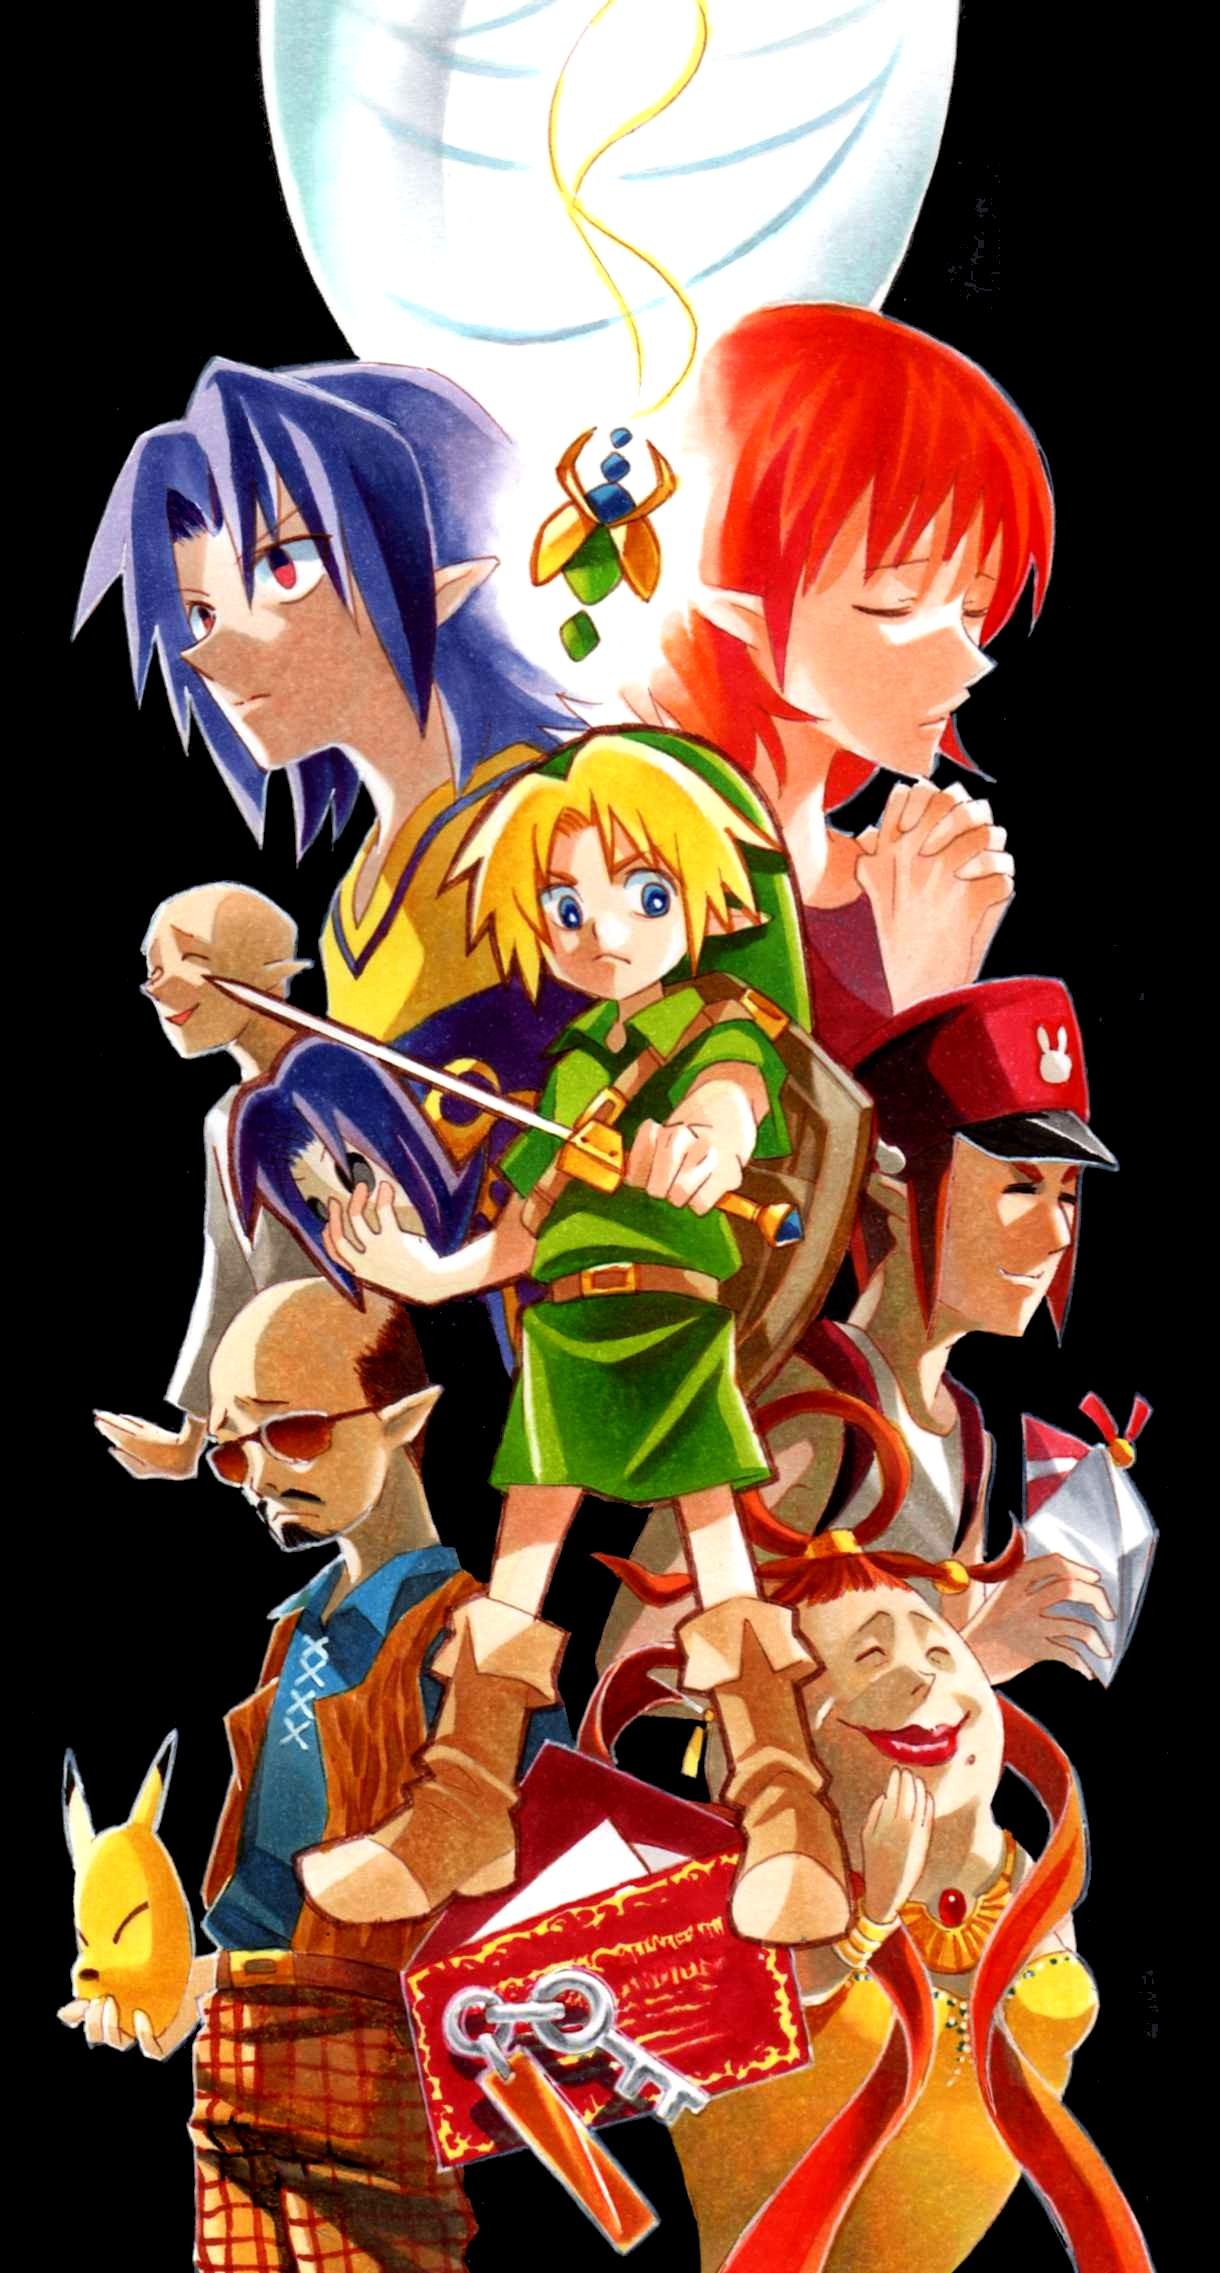 Postman (Zelda no Densetsu) - Zerochan Anime Image Board